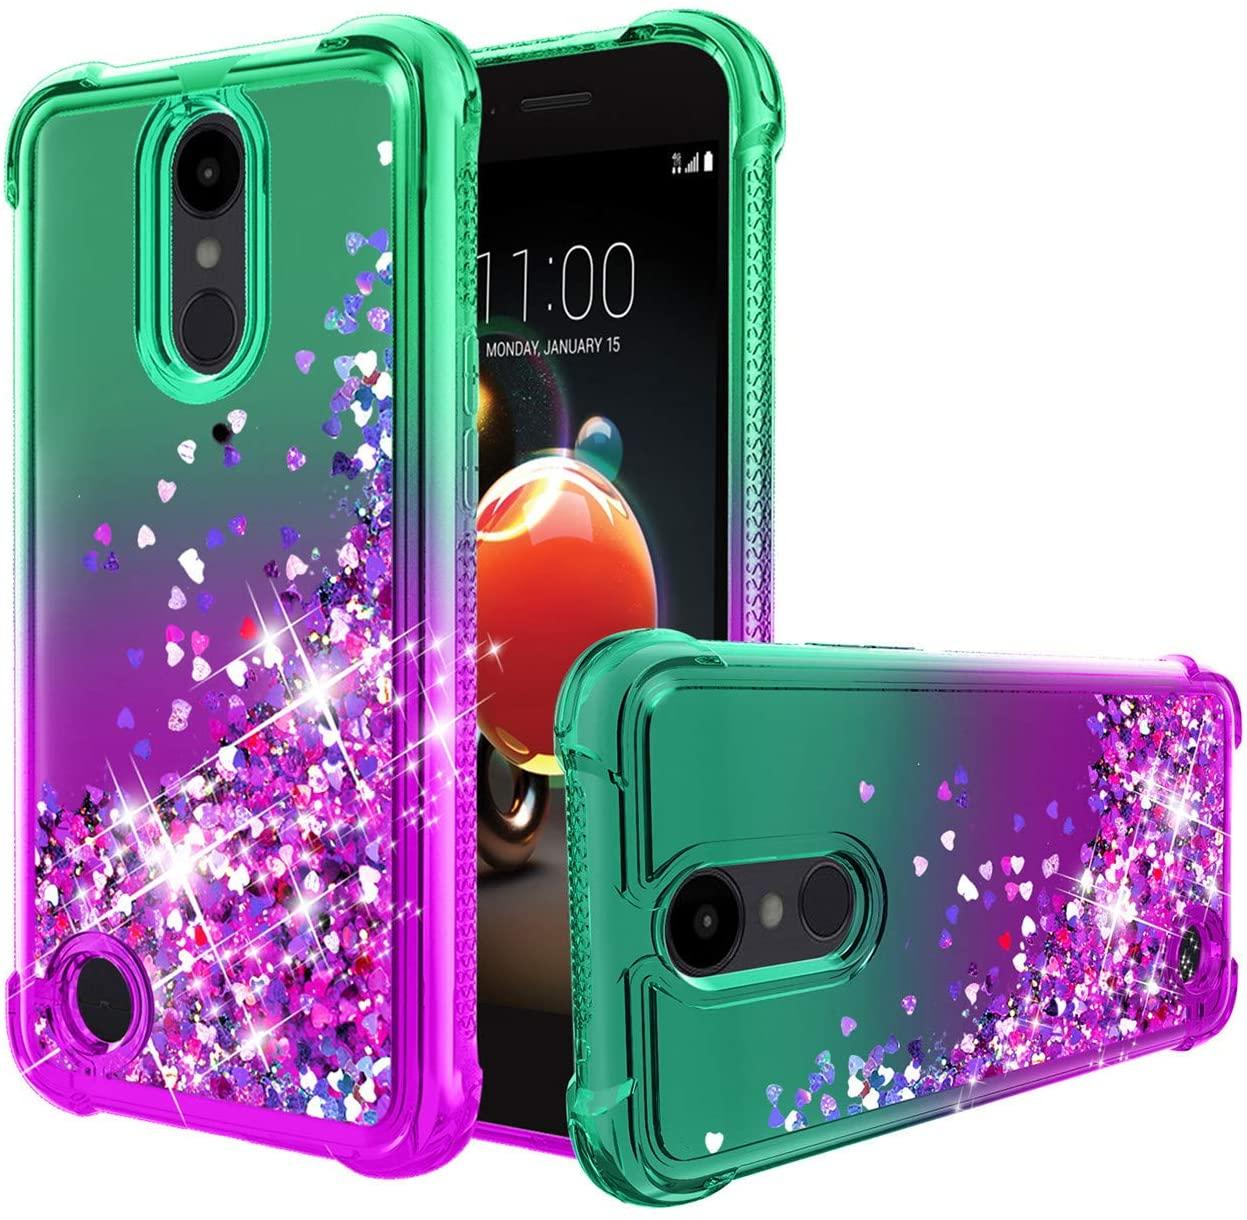 LG Aristo 3 Case,Tribute Empire/Aristo 2/Aristo 2+ Plus/Aristo 3+ Plus/Tribute Dynasty/K8+/Fortune 2/Zone 4/Rebel 4/Phoenix 4/k8 2018 Case,Quicksand Bling Glitter TPU Shockproof Case.Mint/Purple